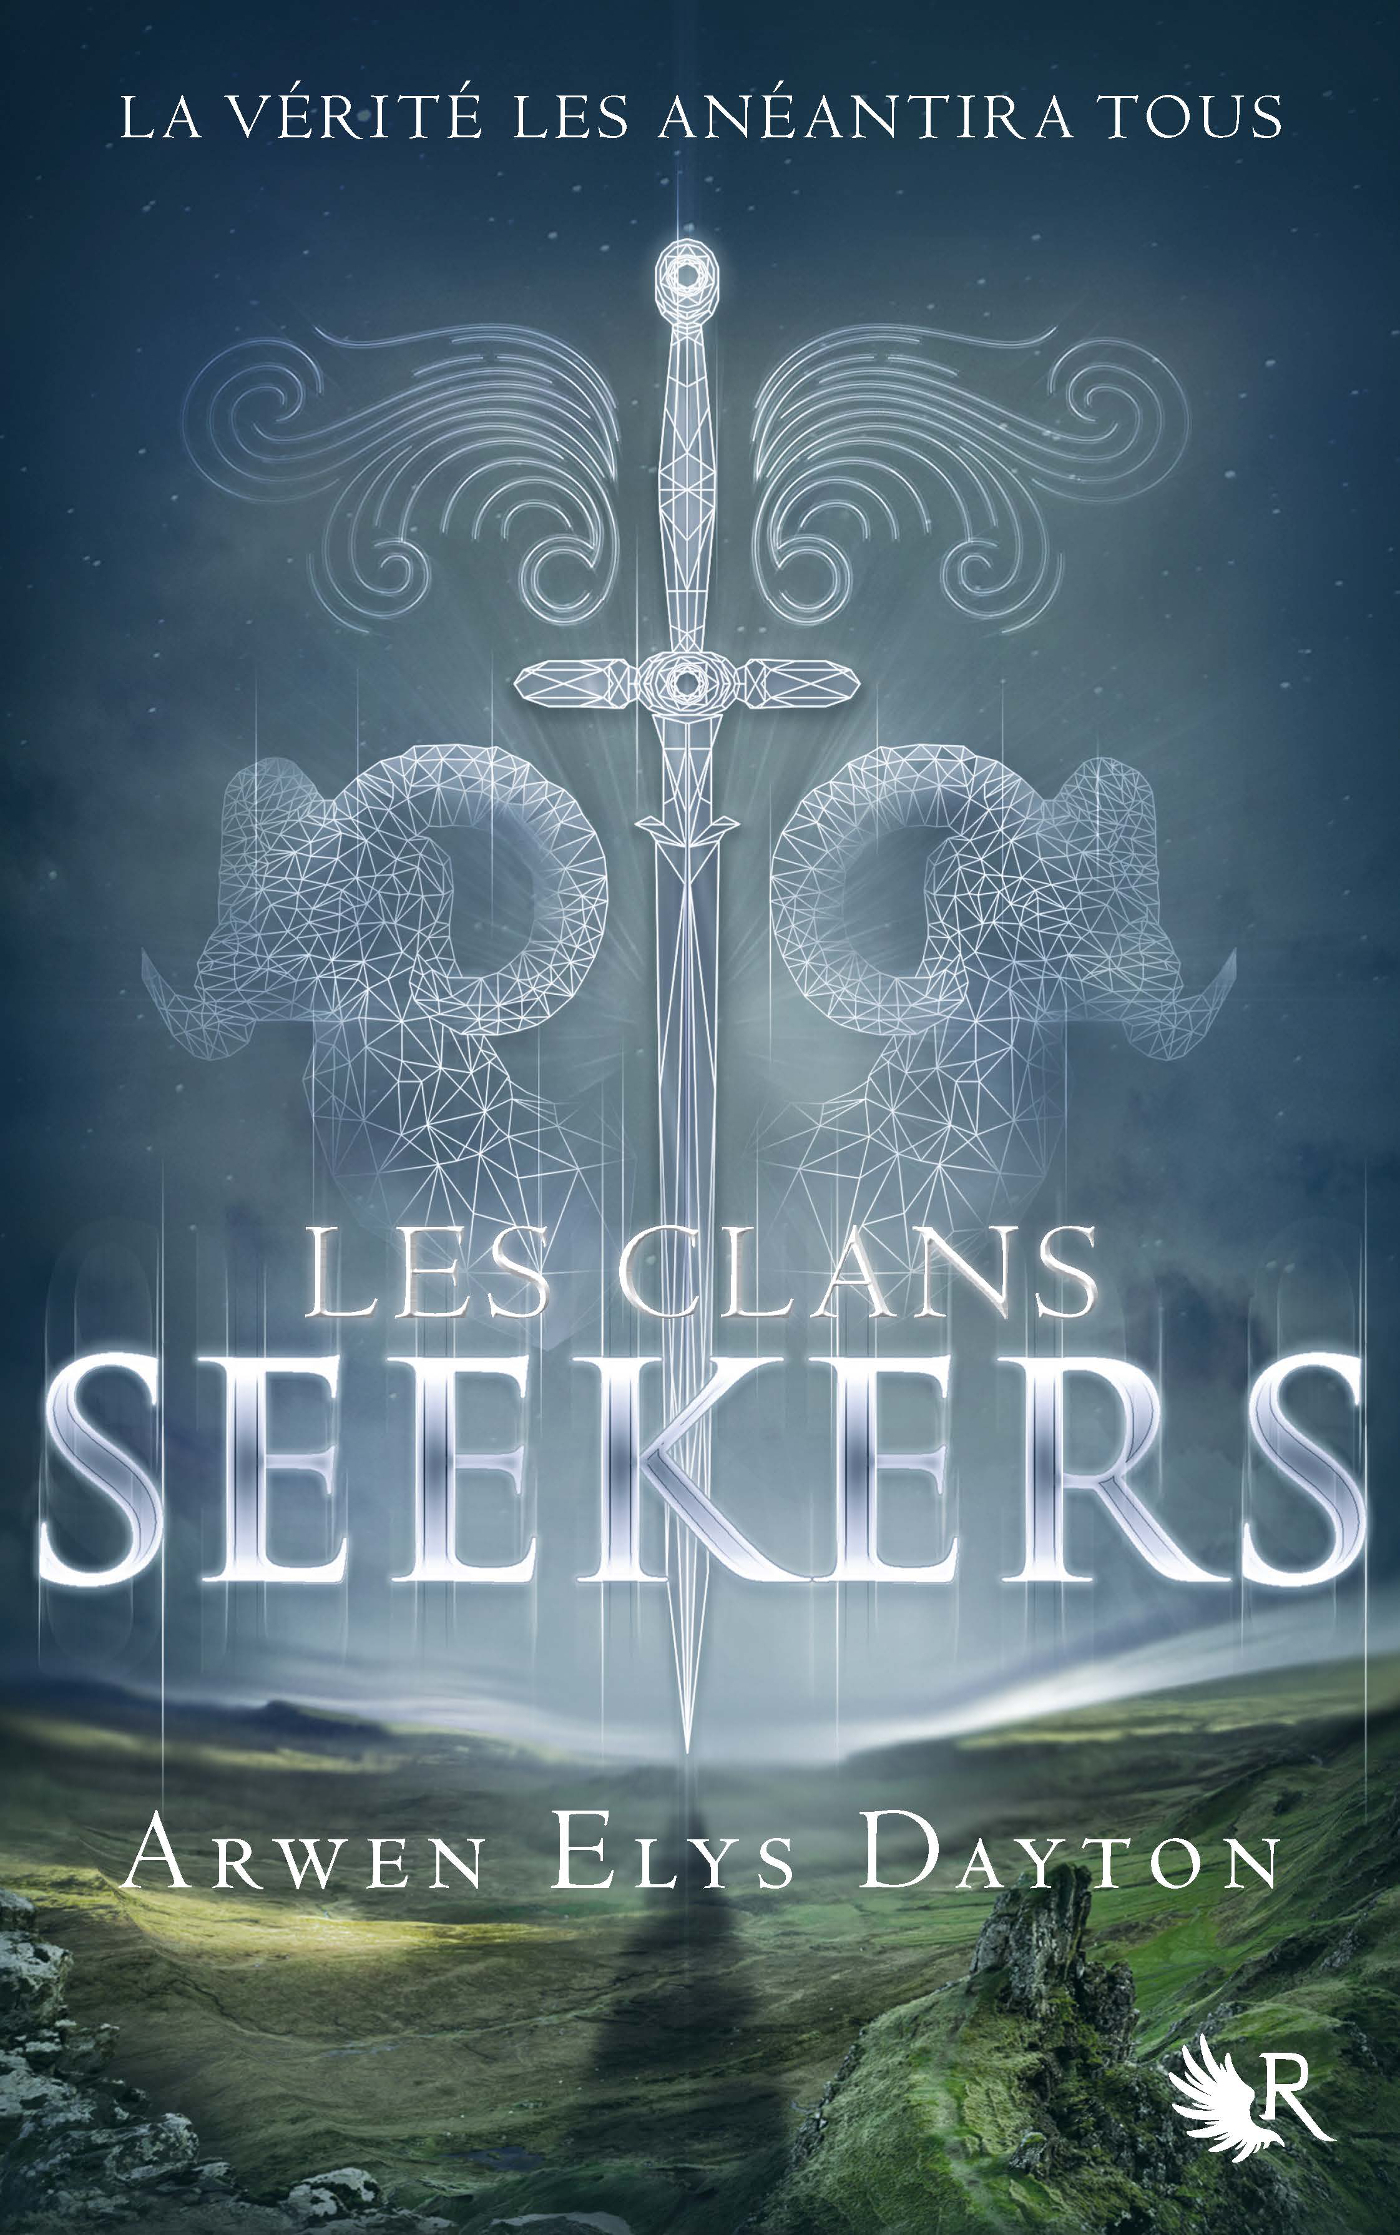 Les Clans Seekers - Livre I | DAYTON, Arwen Elys